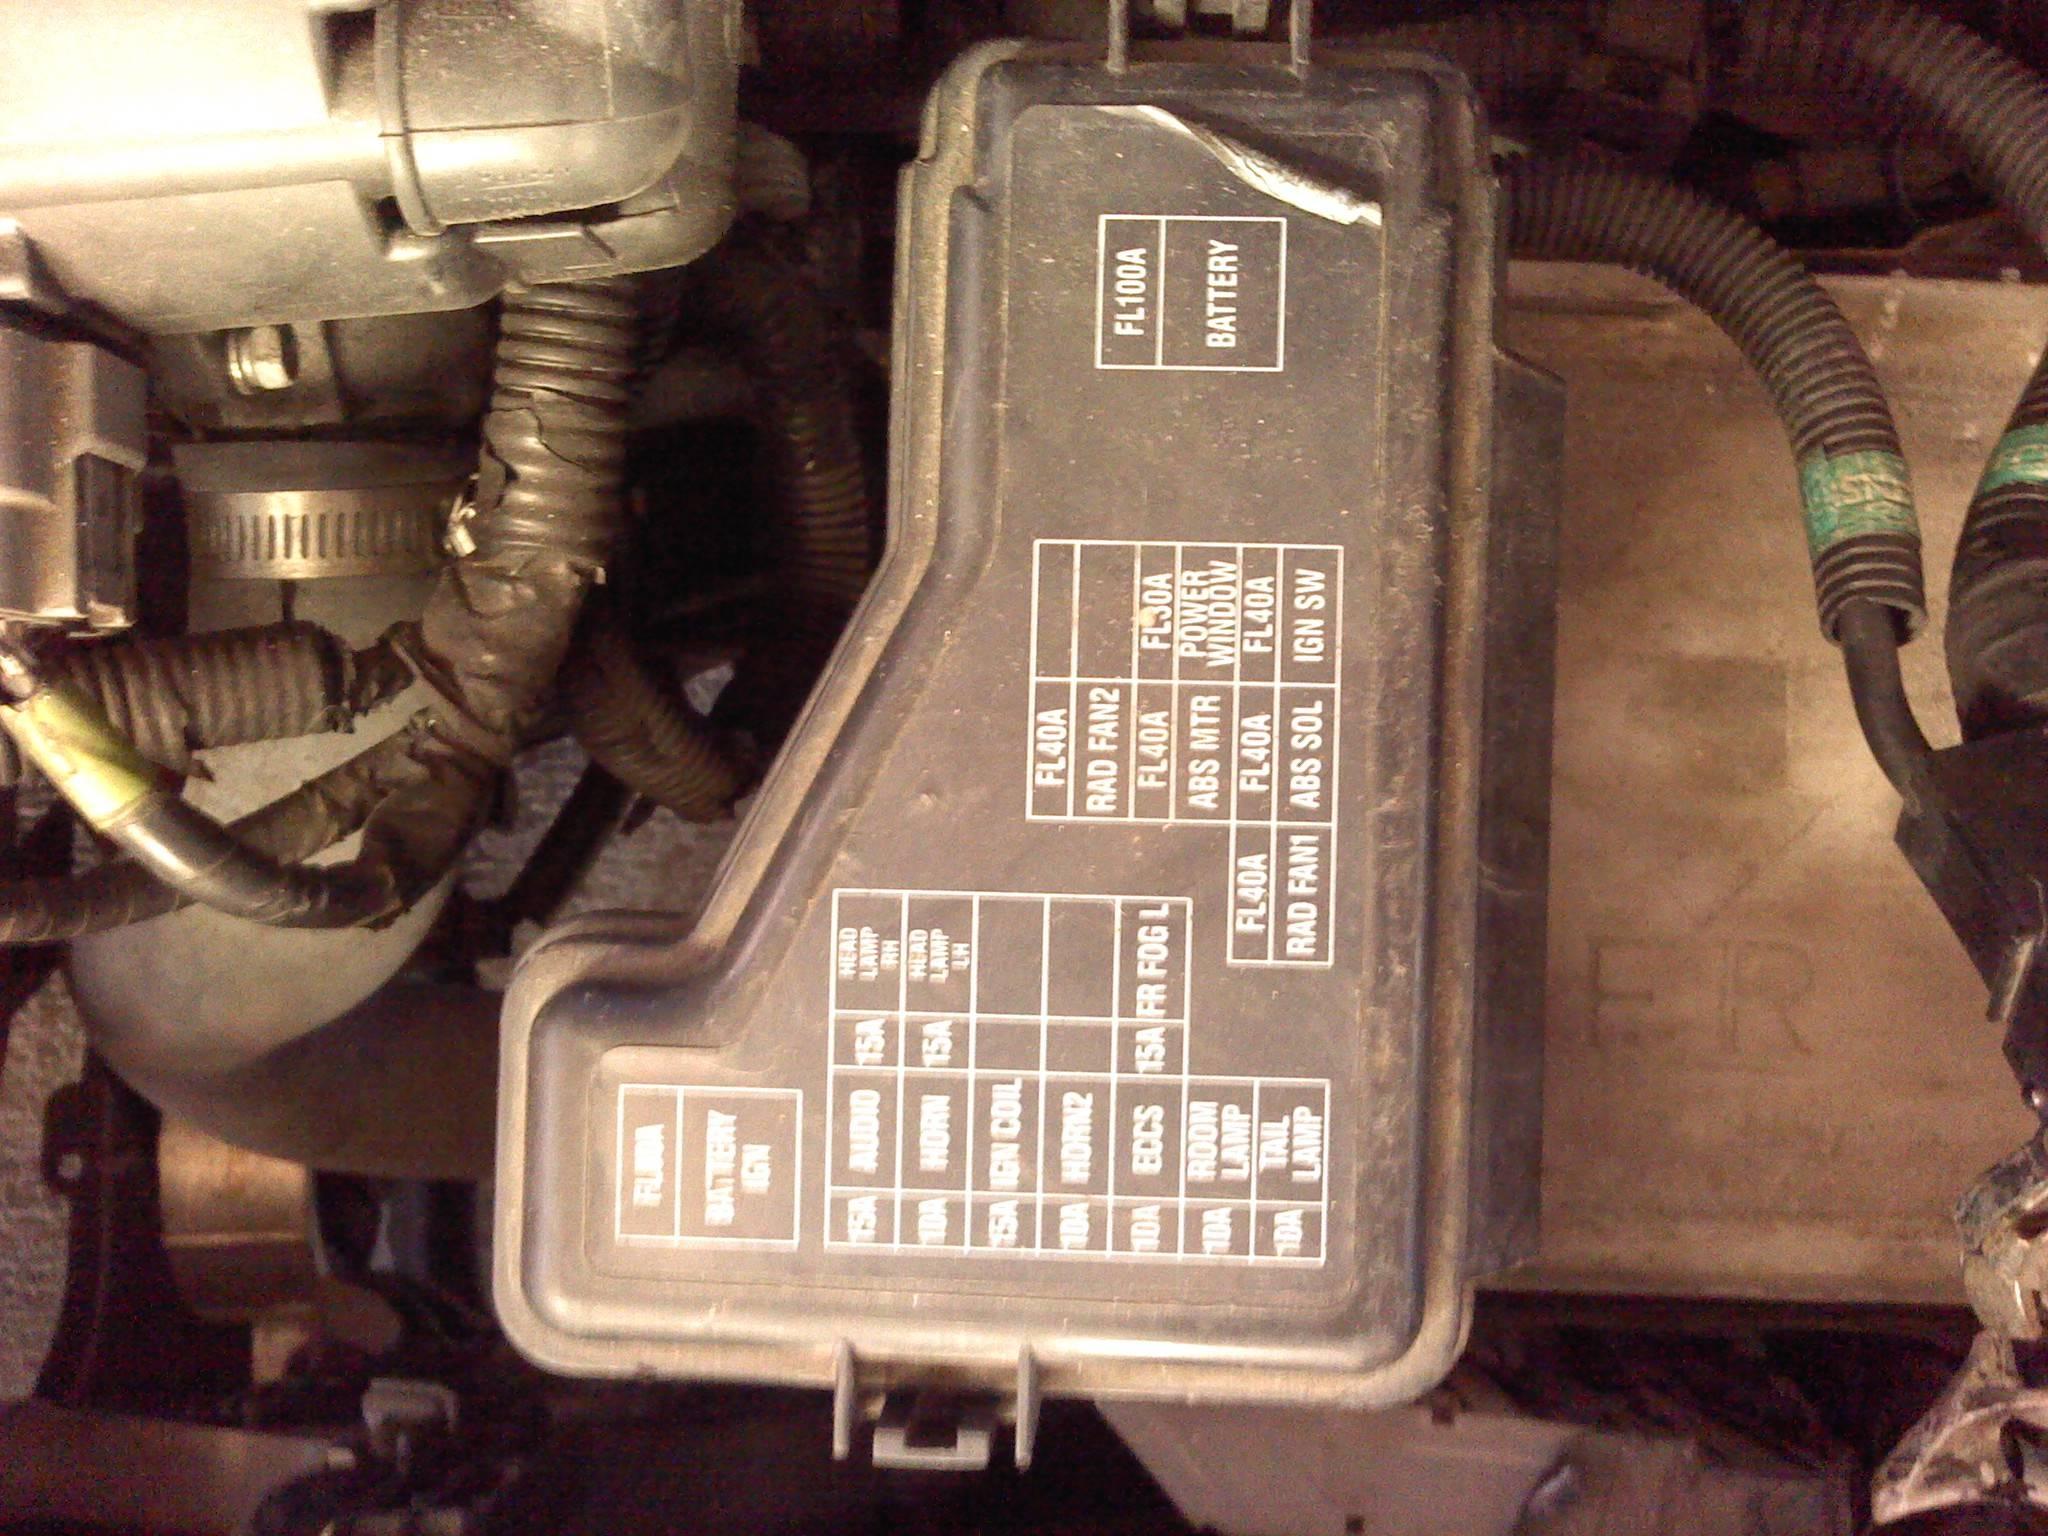 1998 nissan sentra fuse box 2003 nissan sentra fuse box wiring diagram schematics  2003 nissan sentra fuse box wiring